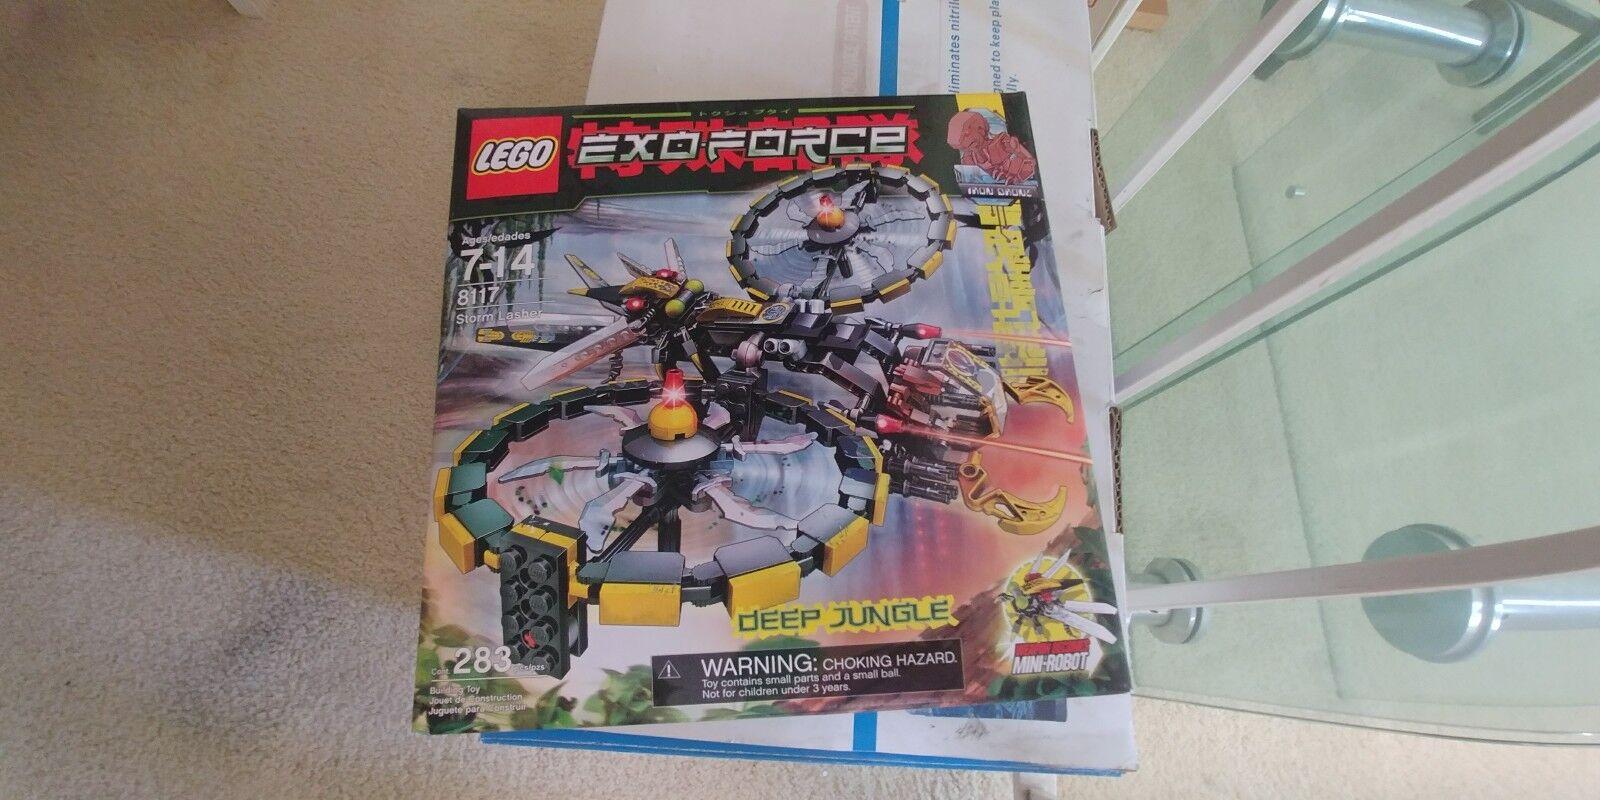 LEGO Exo-Force The  Robots Deep Jungle Storm Lasher NISB (Item  8117)  prezzi eccellenti